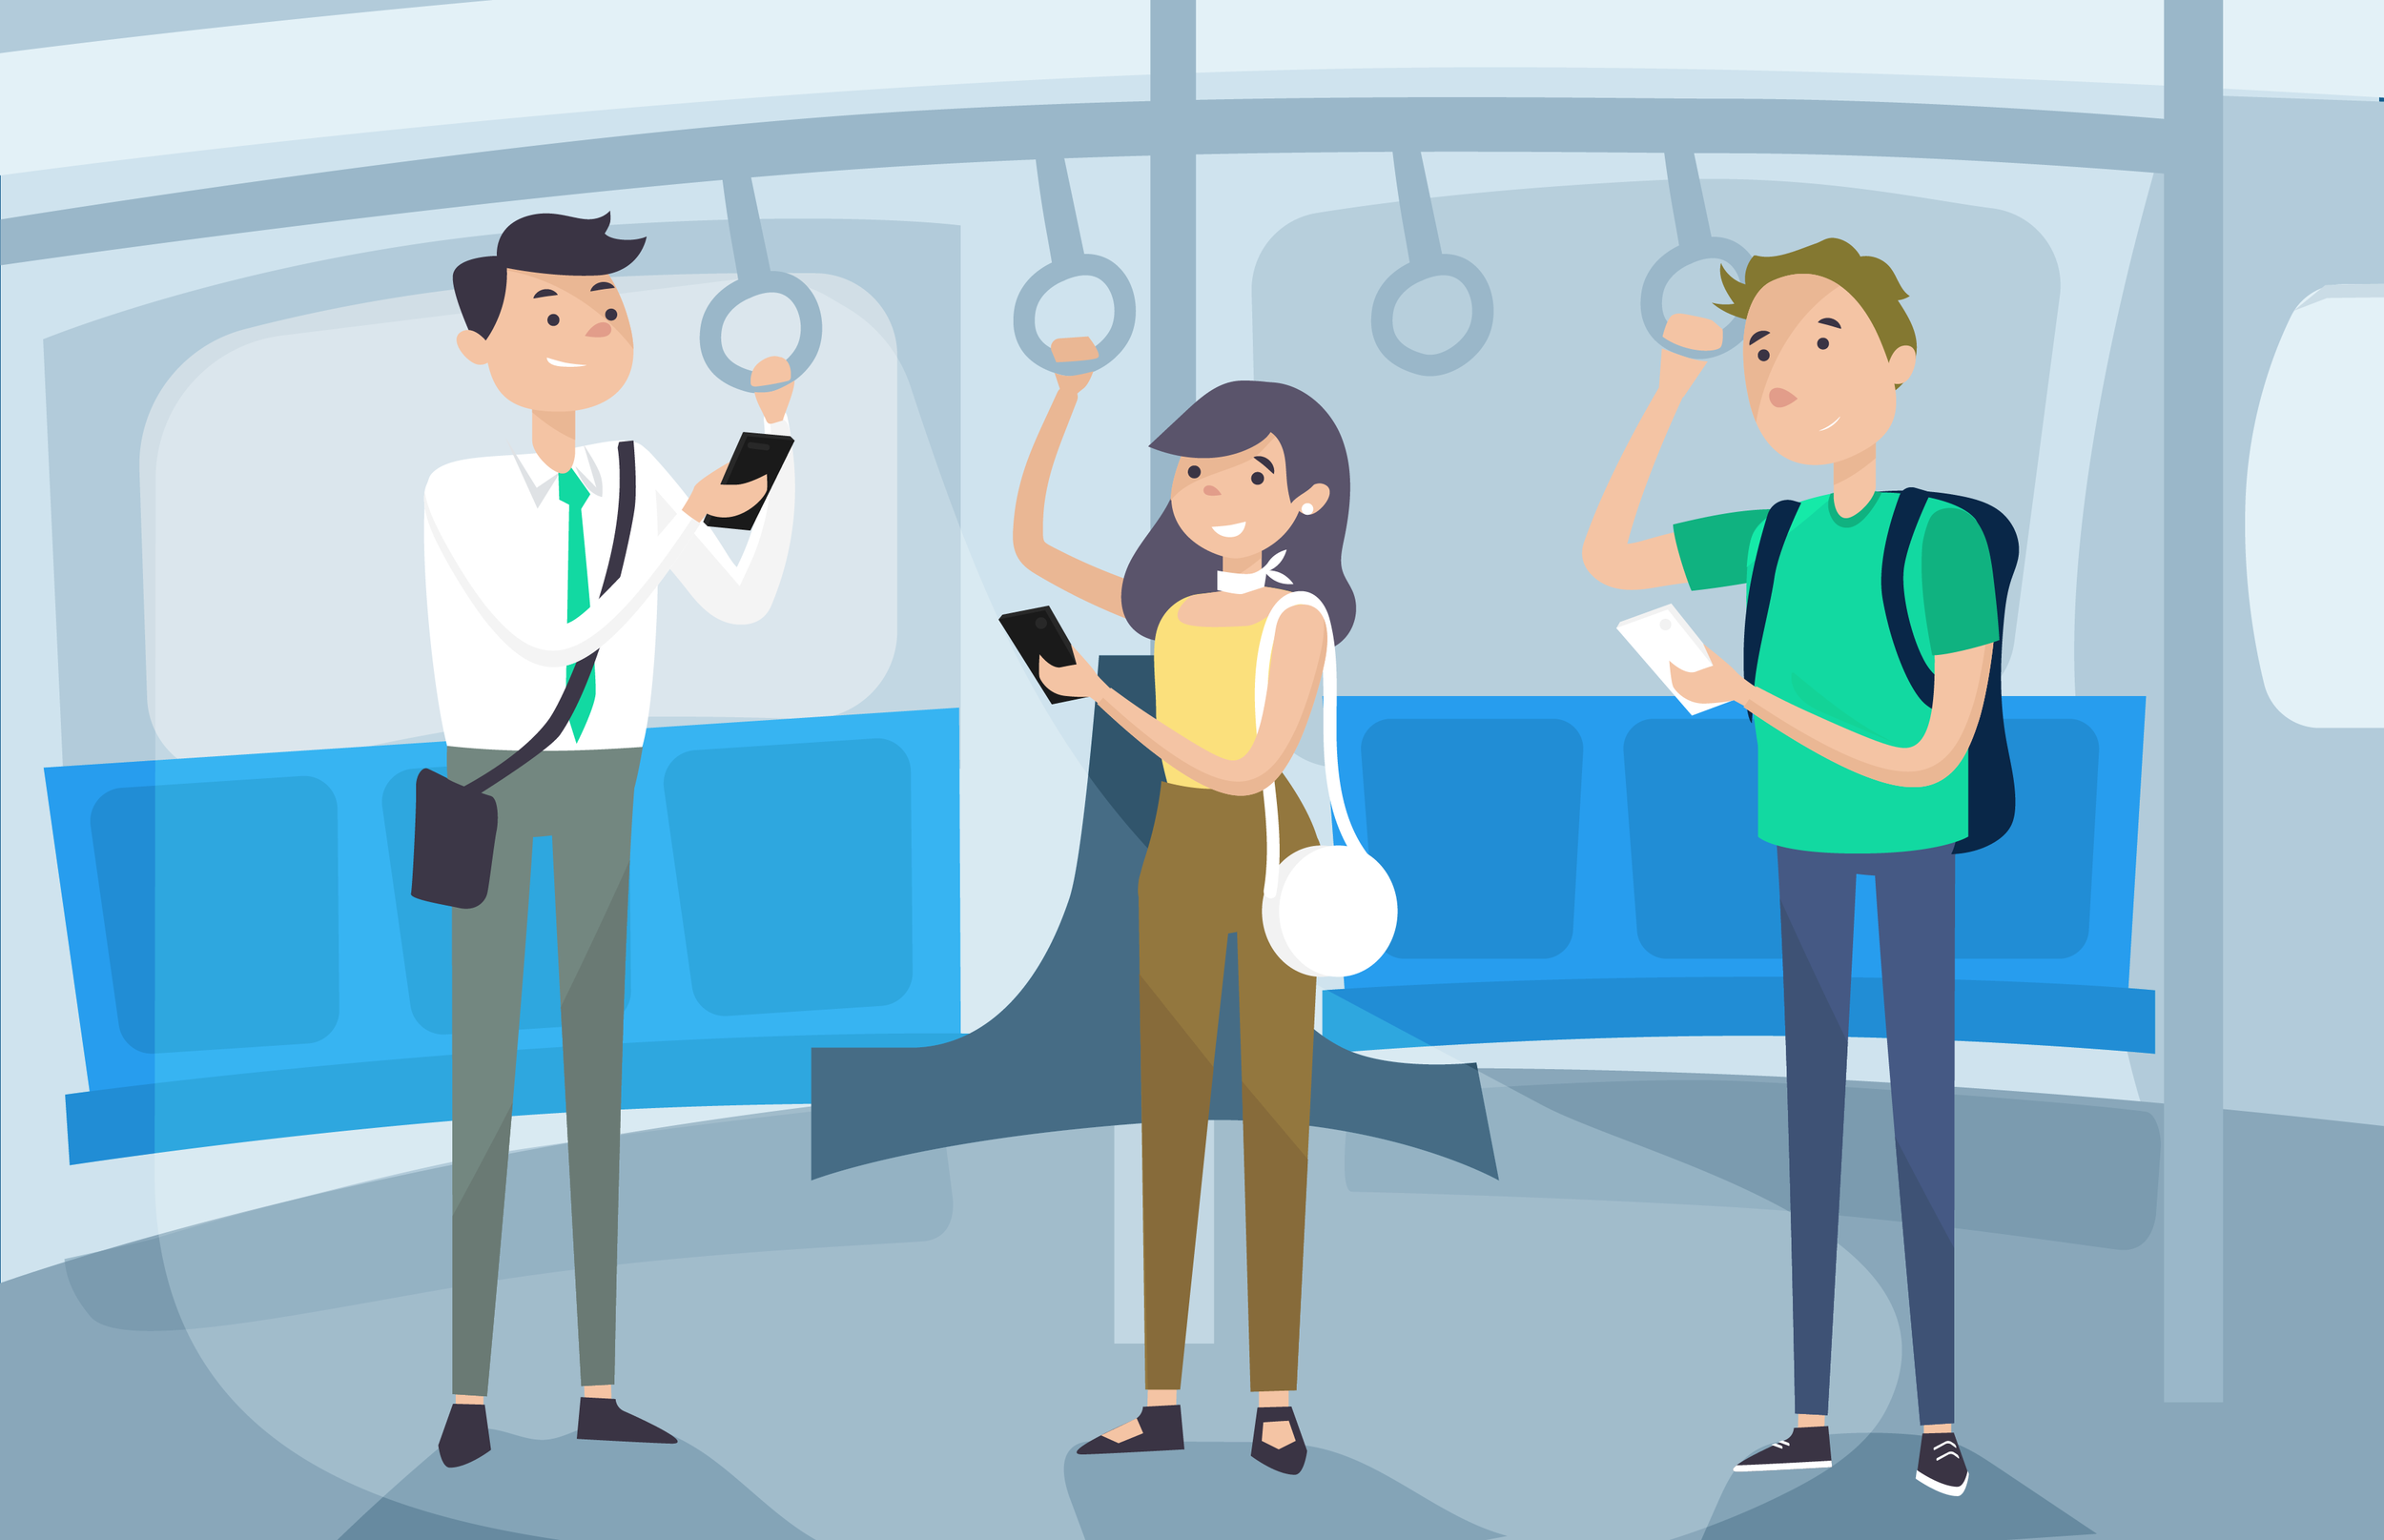 people-using-phone-on-train.jpg